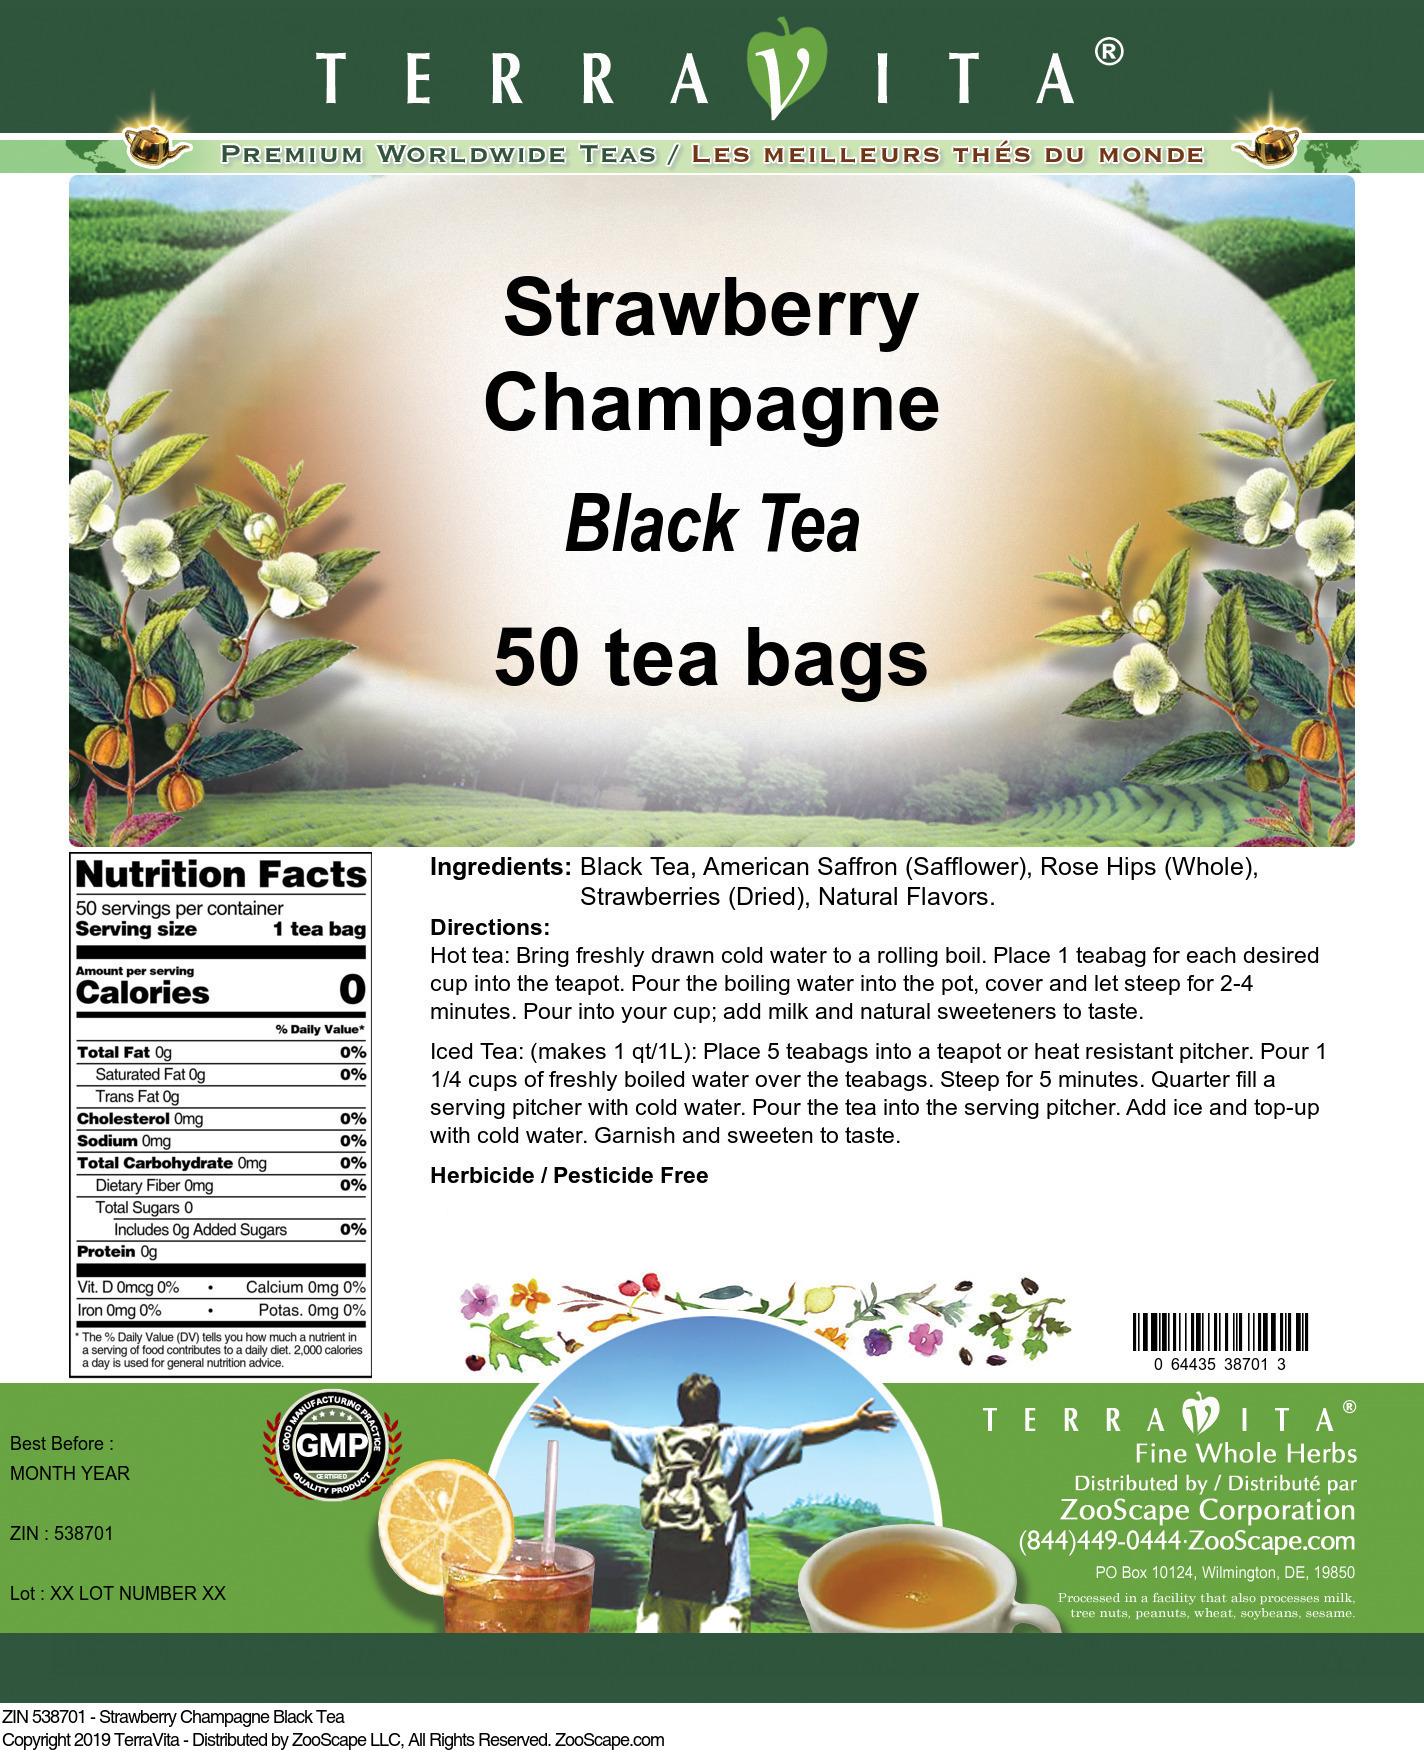 Strawberry Champagne Black Tea